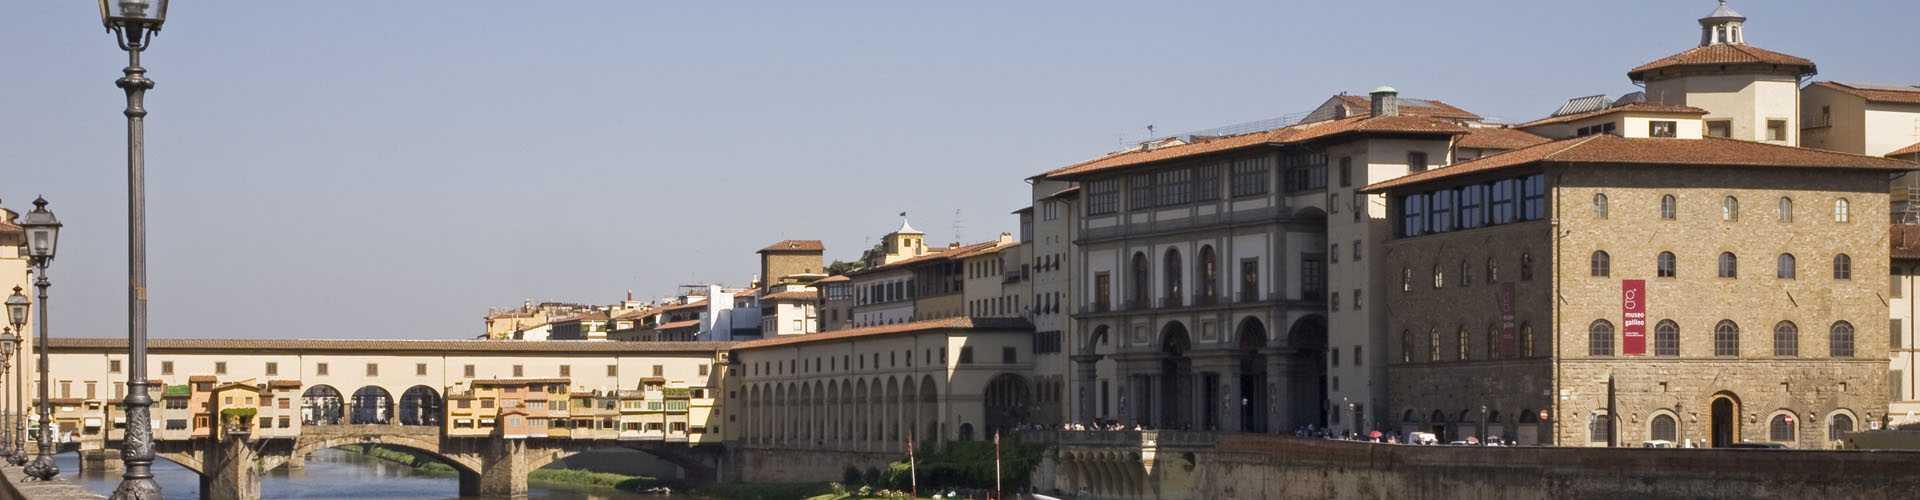 Museo Galileo Firenze.The Museum Building Museo Galileo